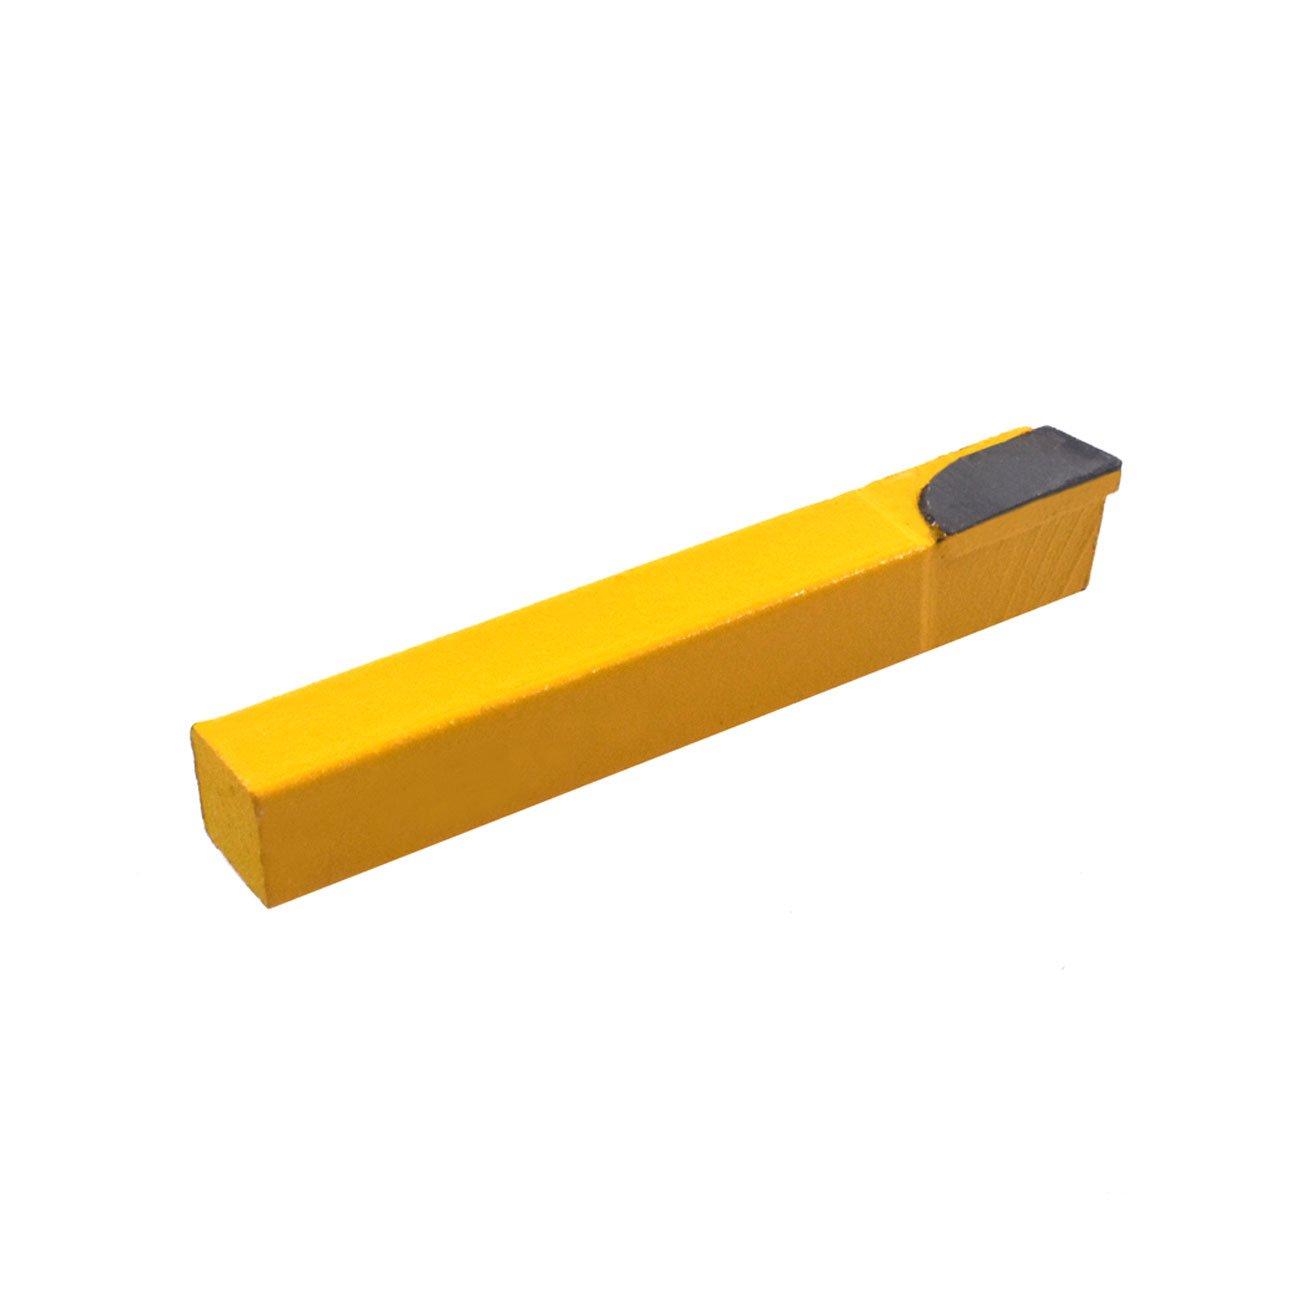 1.25 Height 1.37 Length Oilite FF1314-03 1.1270 1.3770 1.2500 1-3//4 1//8 Sintered Flange Bronze 1.37 Width 1.1270 ID